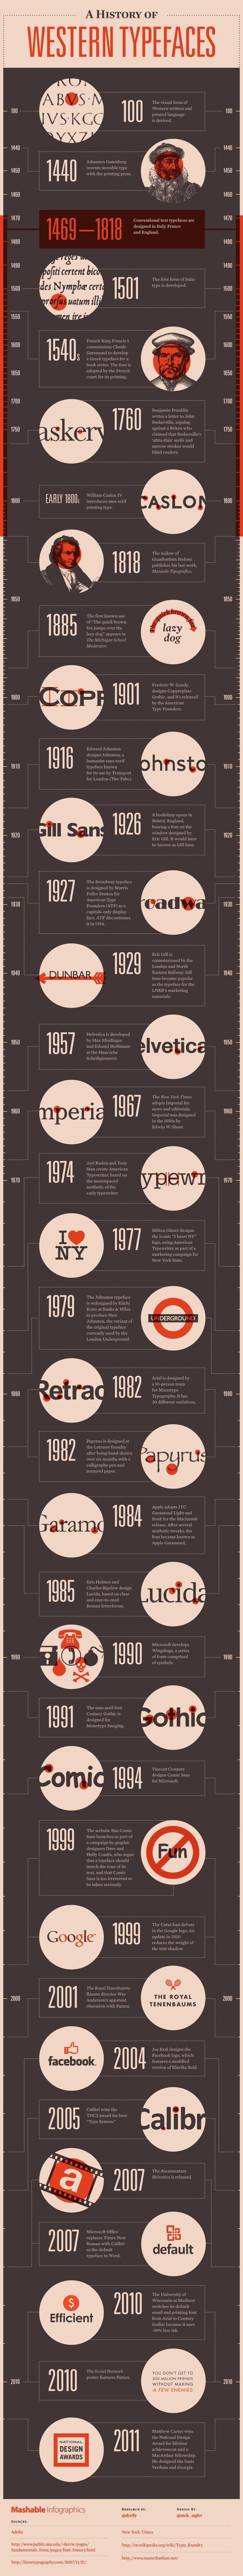 A History of Western Typefaces, infographic design by Nickolas Sigler. http://nicksigler.com/